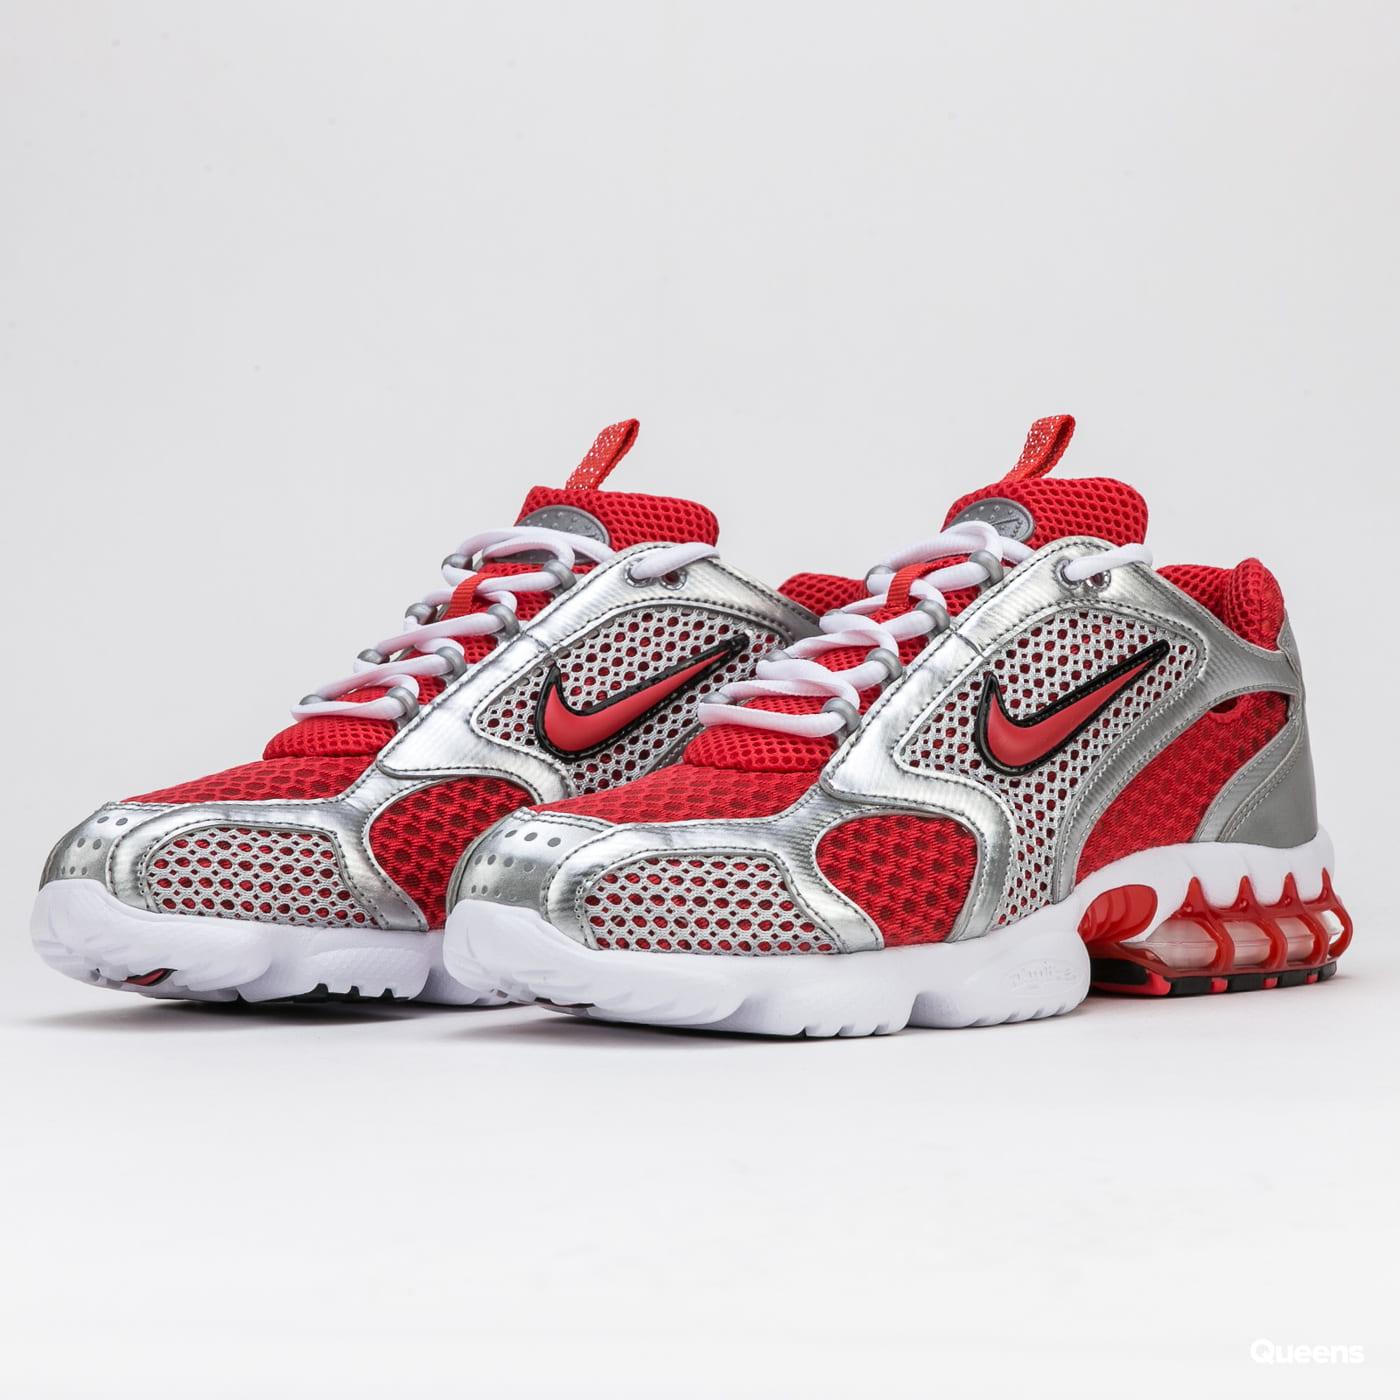 Sneakers Nike Air Zoom Spiridon Cage 2